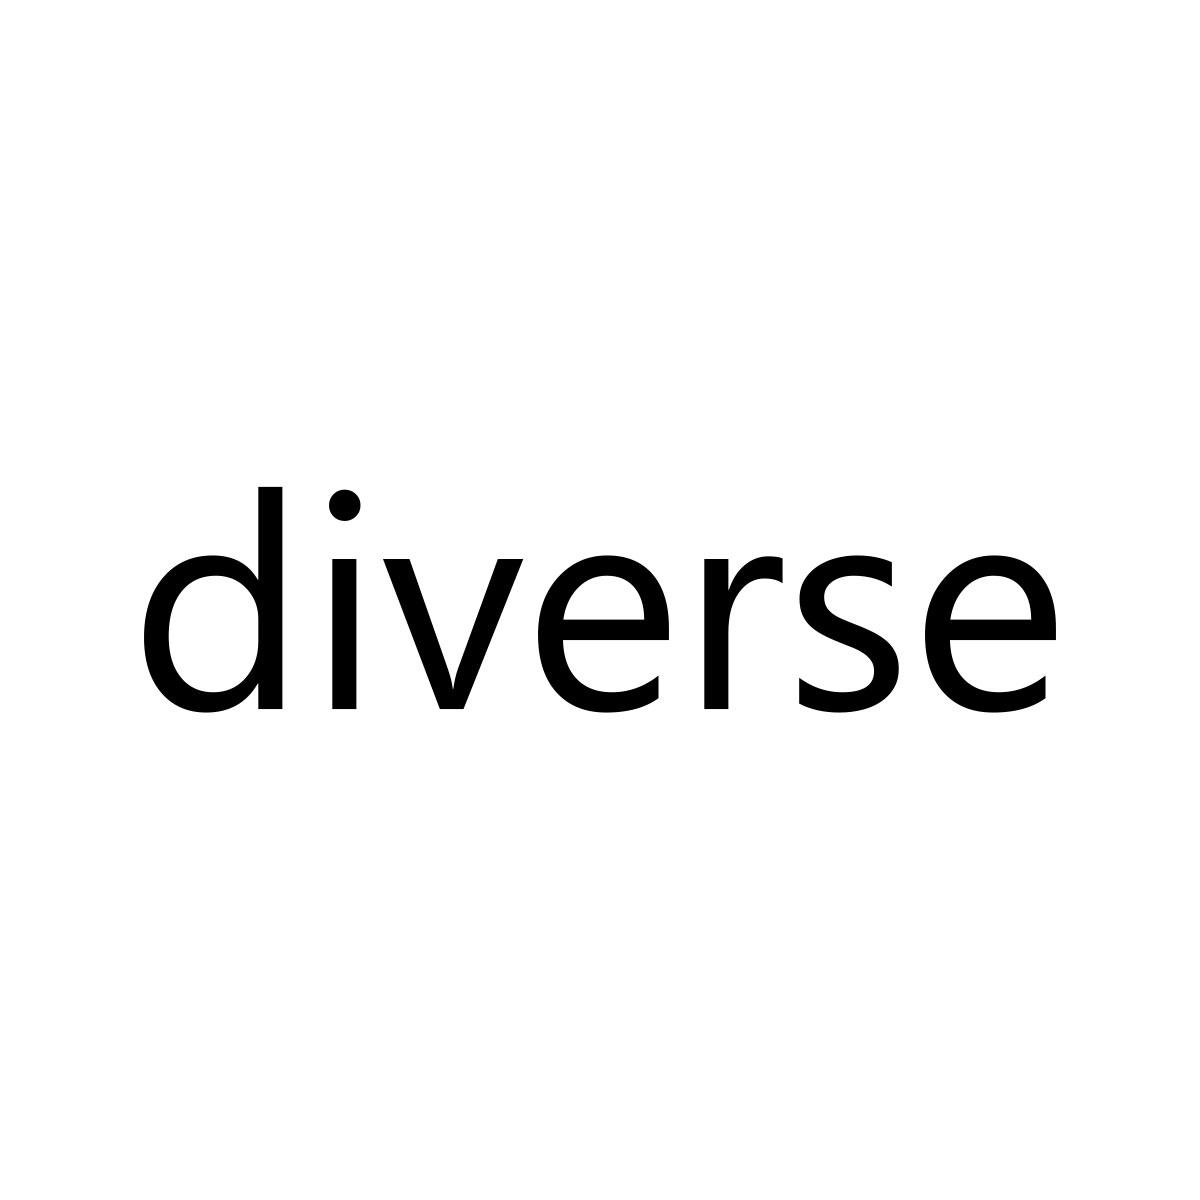 DIVERSE-LOGO